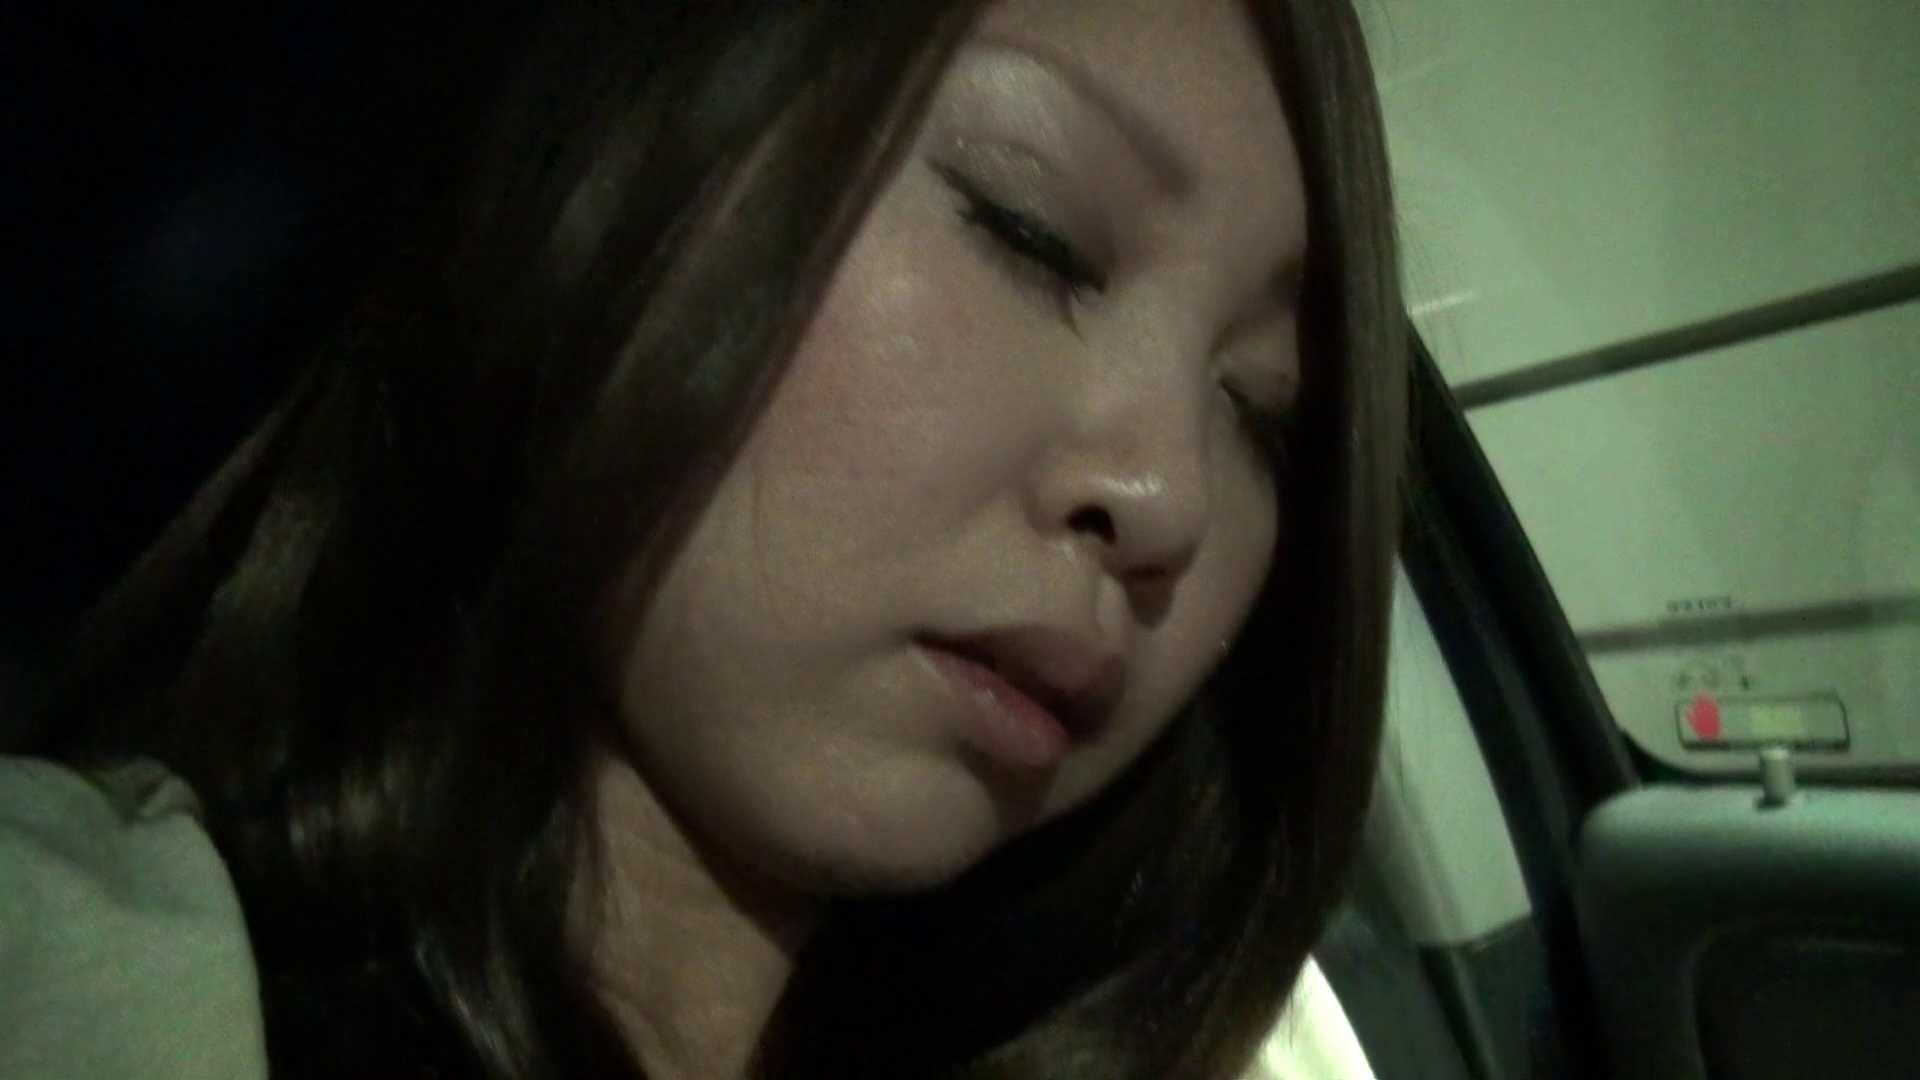 episode6 ドライブ中に・・・妻に強せいオナニー 淫乱  84連発 38